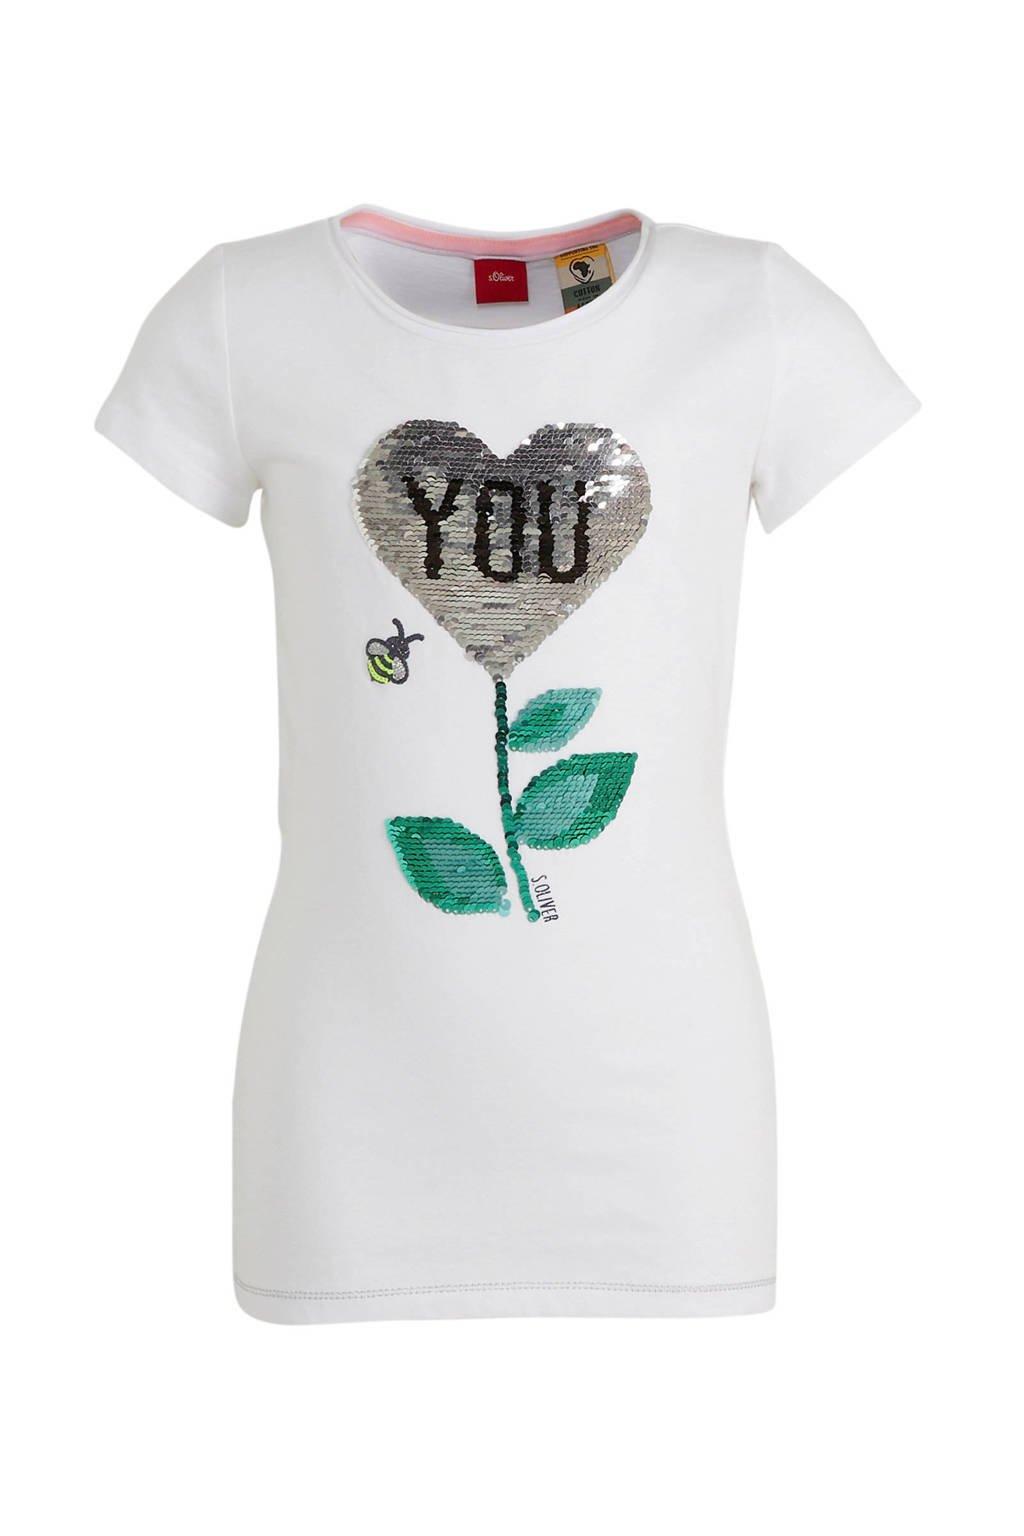 s.Oliver T-shirt met printopdruk en pailletten wit/groen, Wit/groen